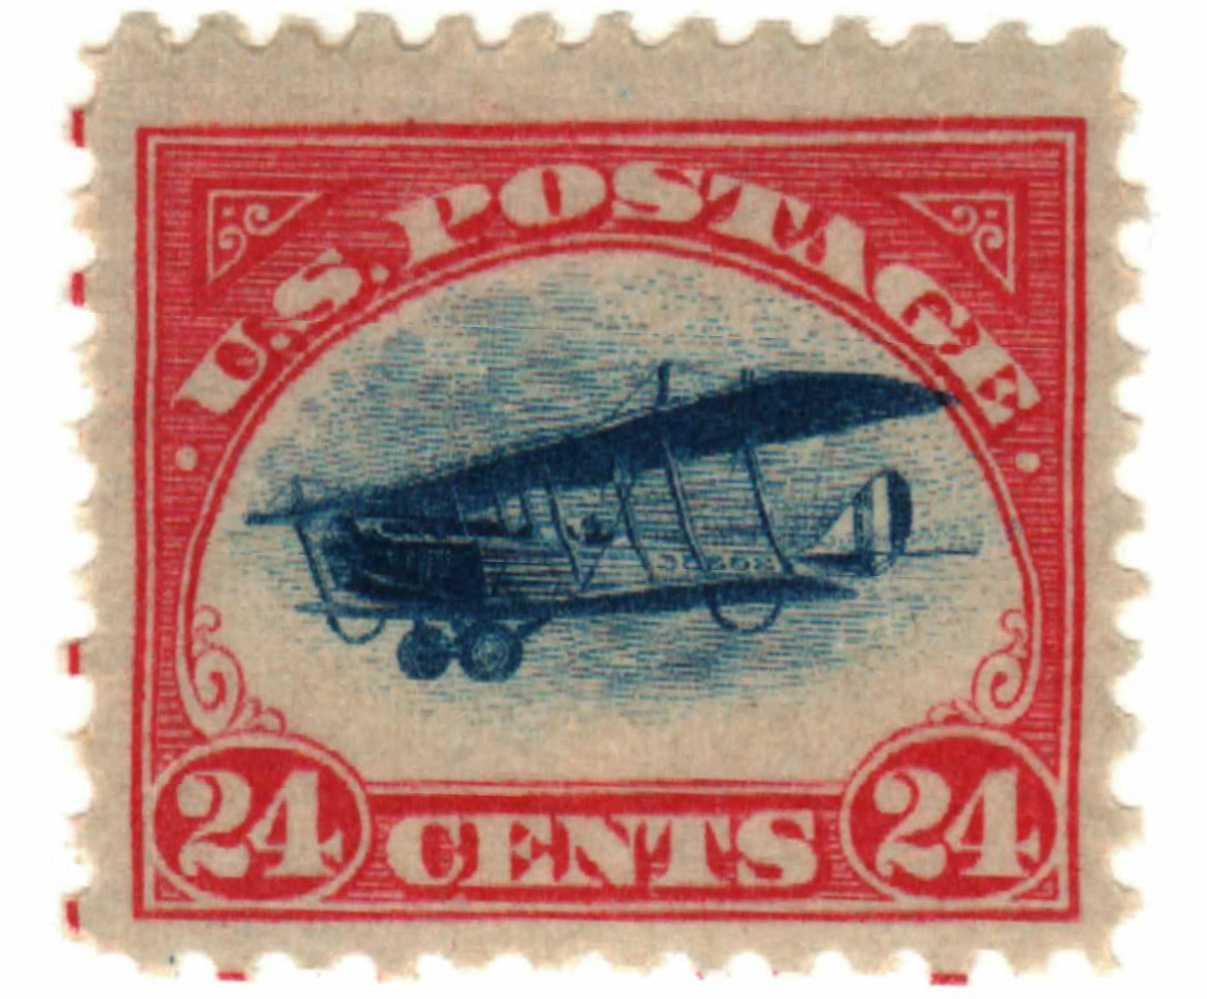 1918 24c Curtiss Jenny, carmine rose & blue